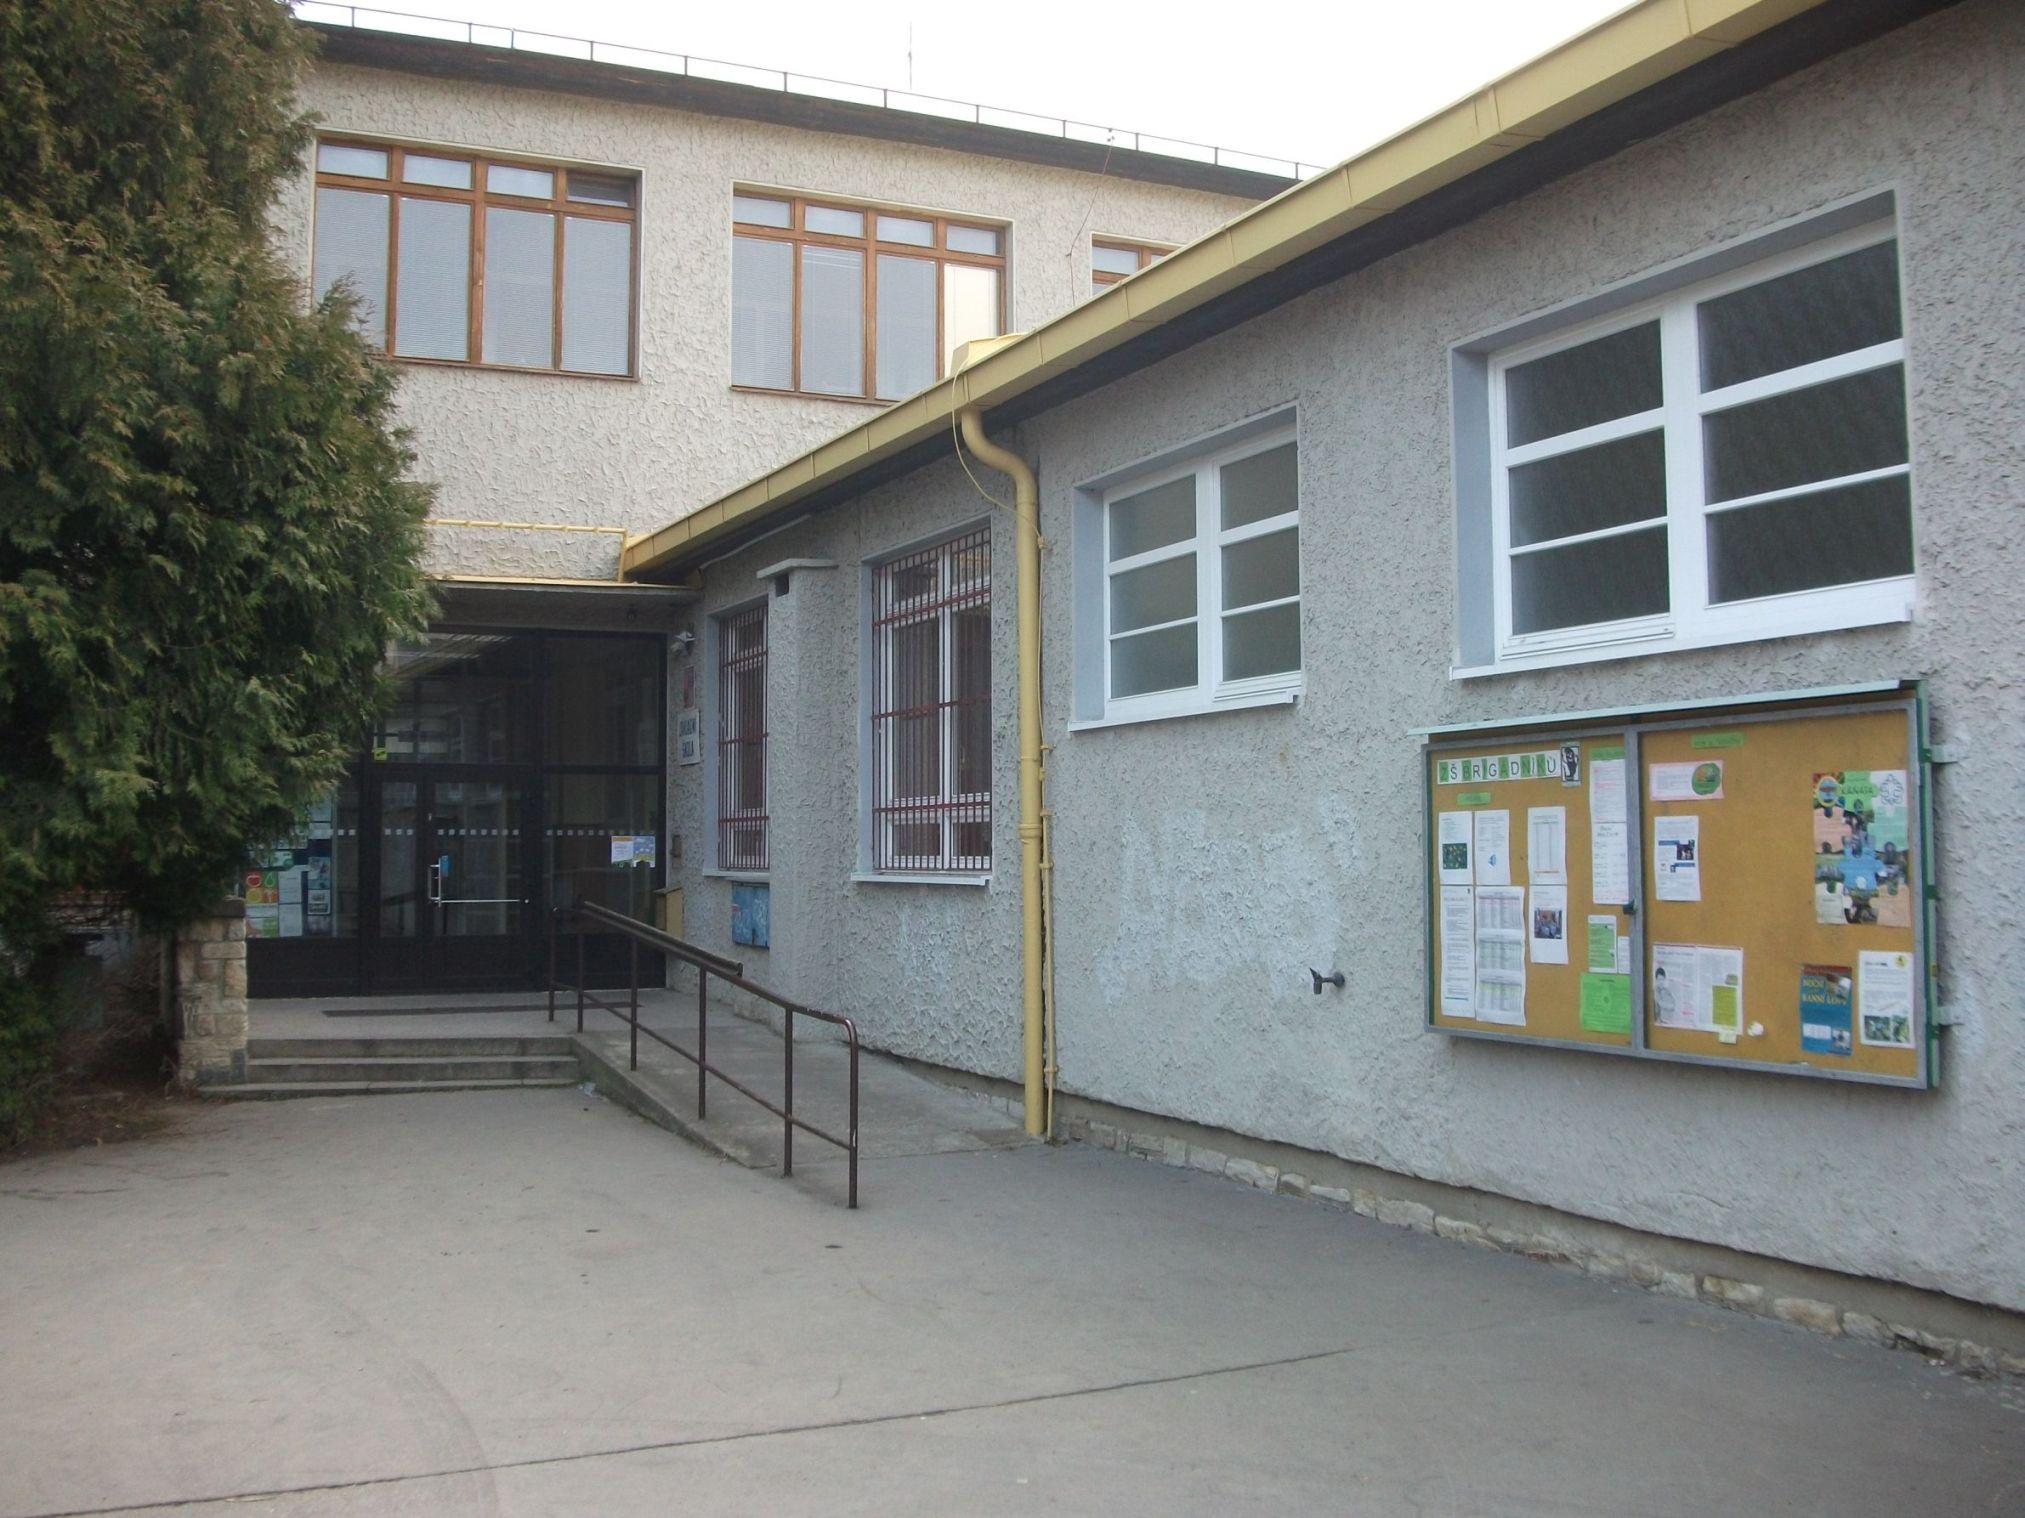 Brigadniku-Praha-Primary-school-in-Slovakia1.png